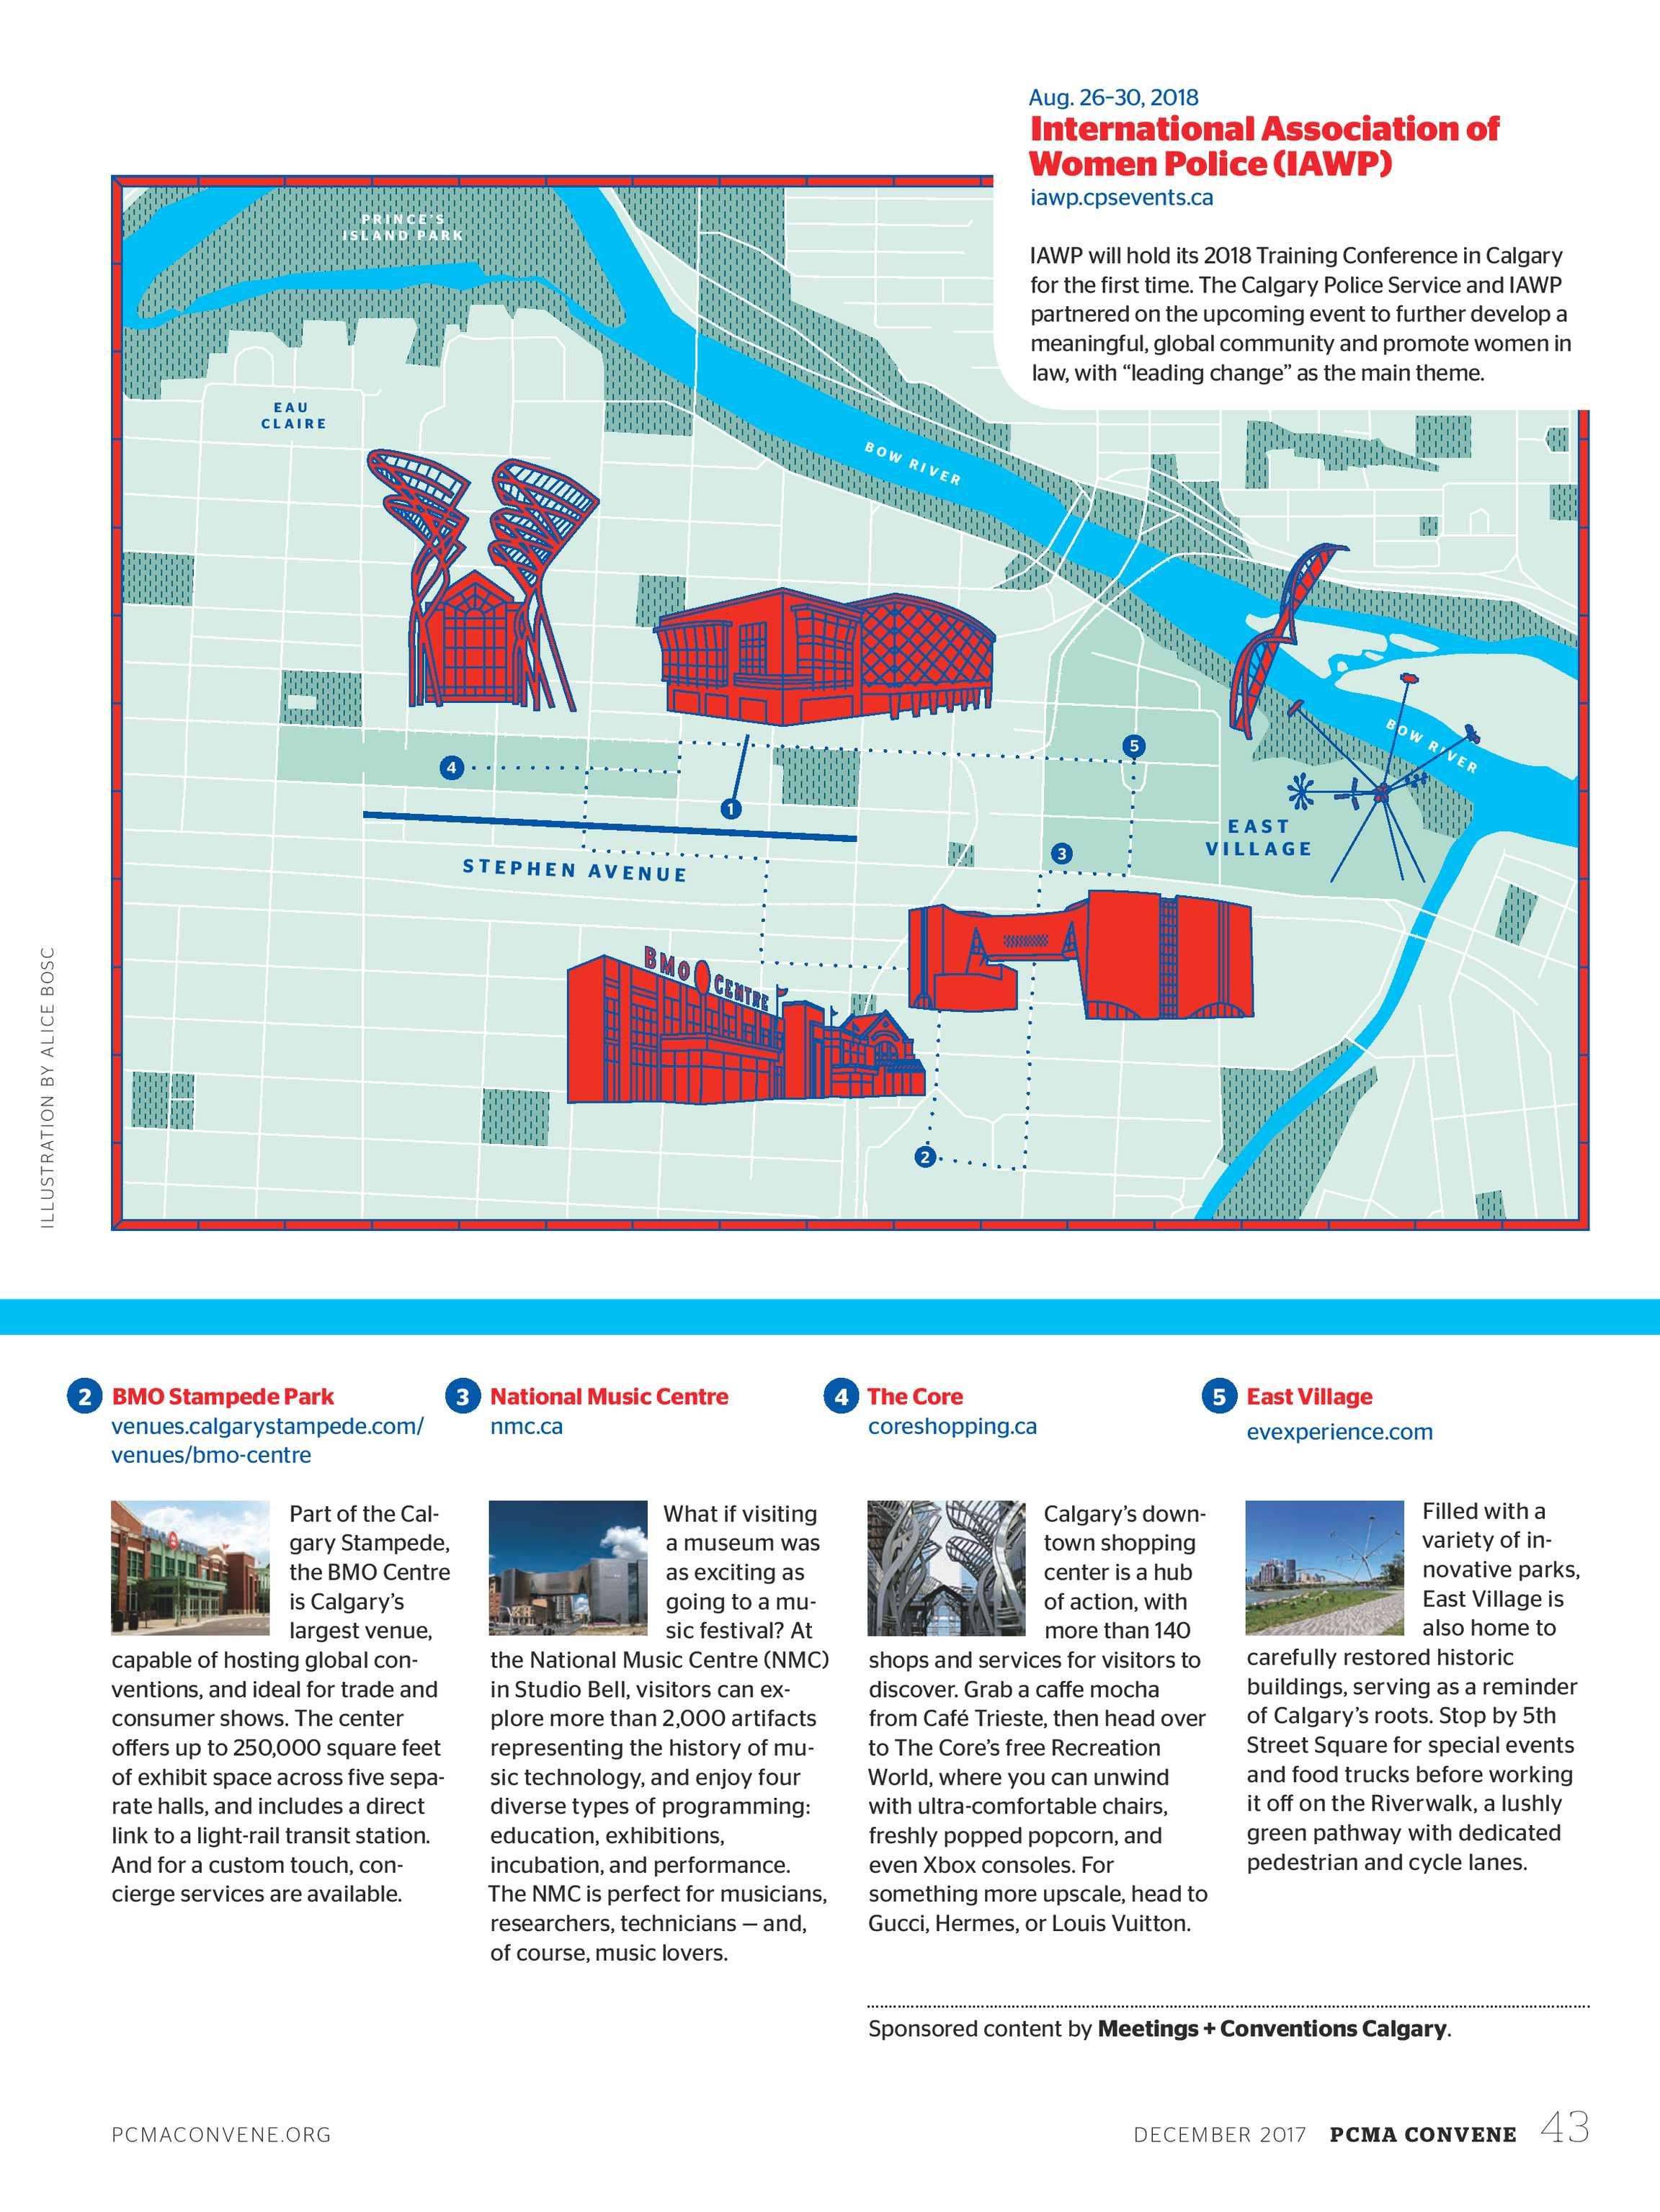 Convene - December 2017 - page 44